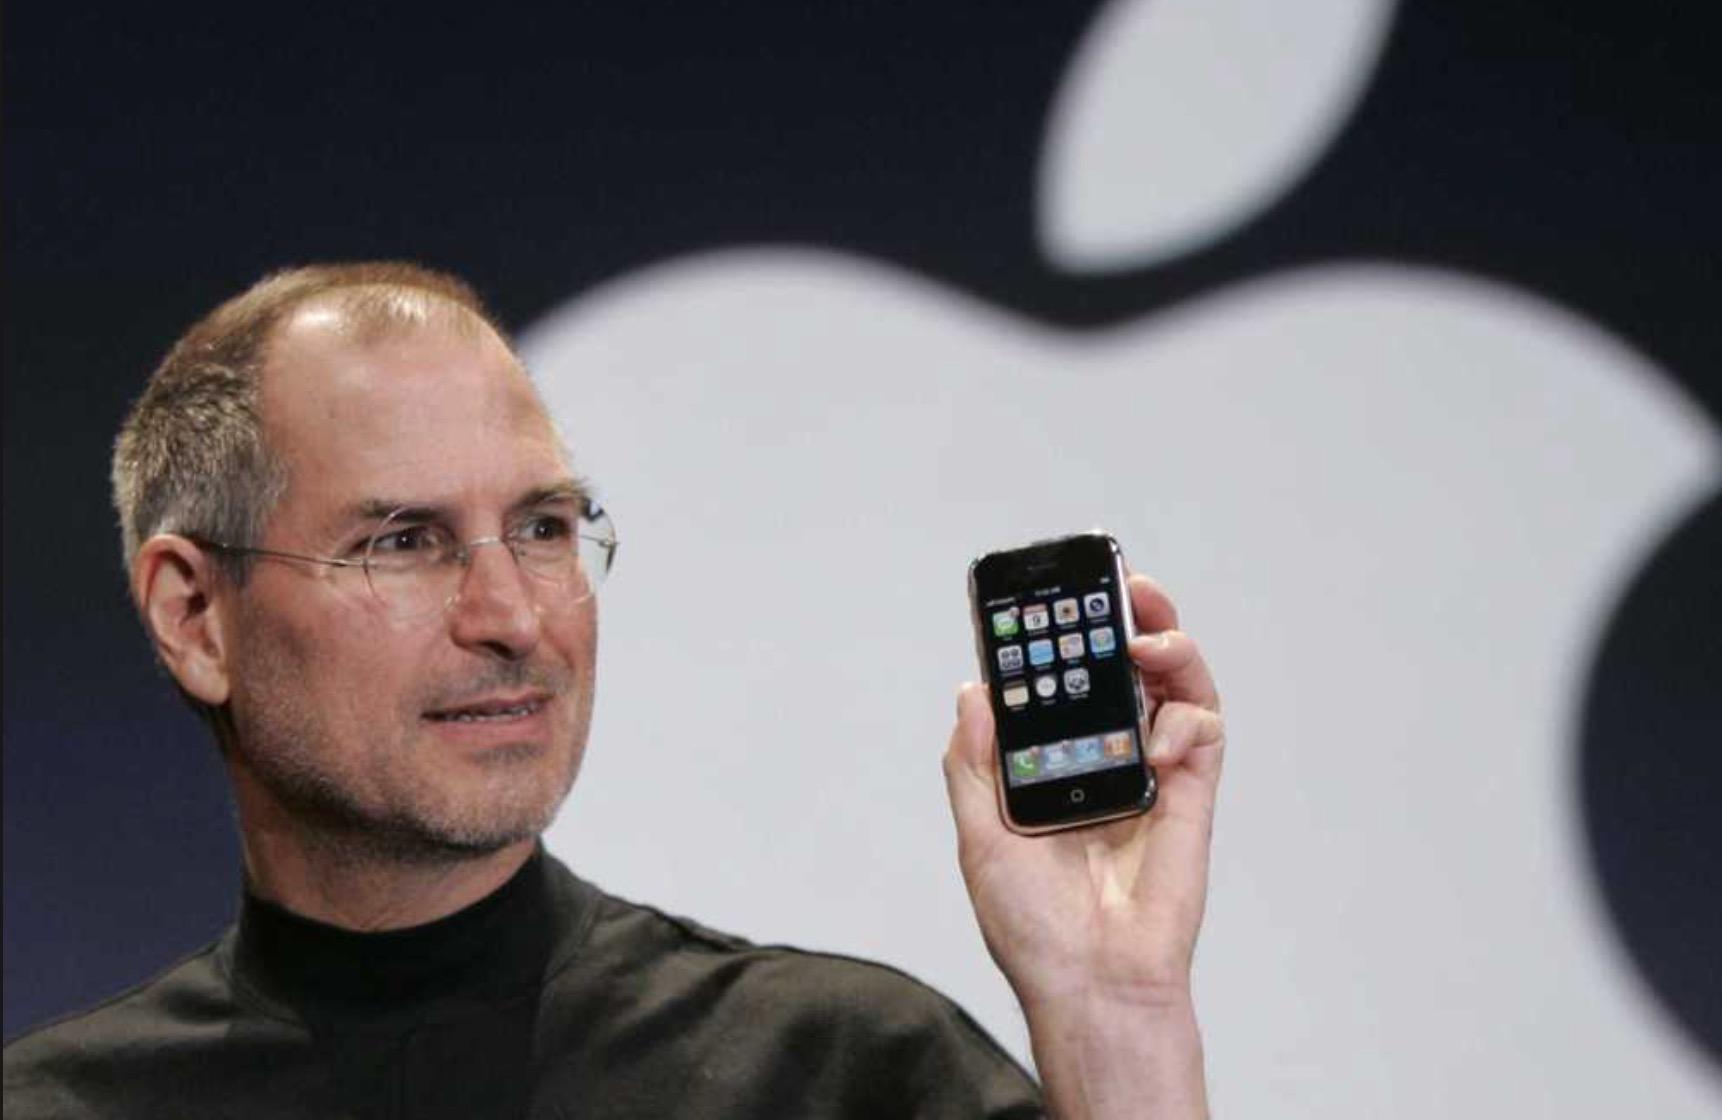 iPhone, il gadget più influente secondo TIME